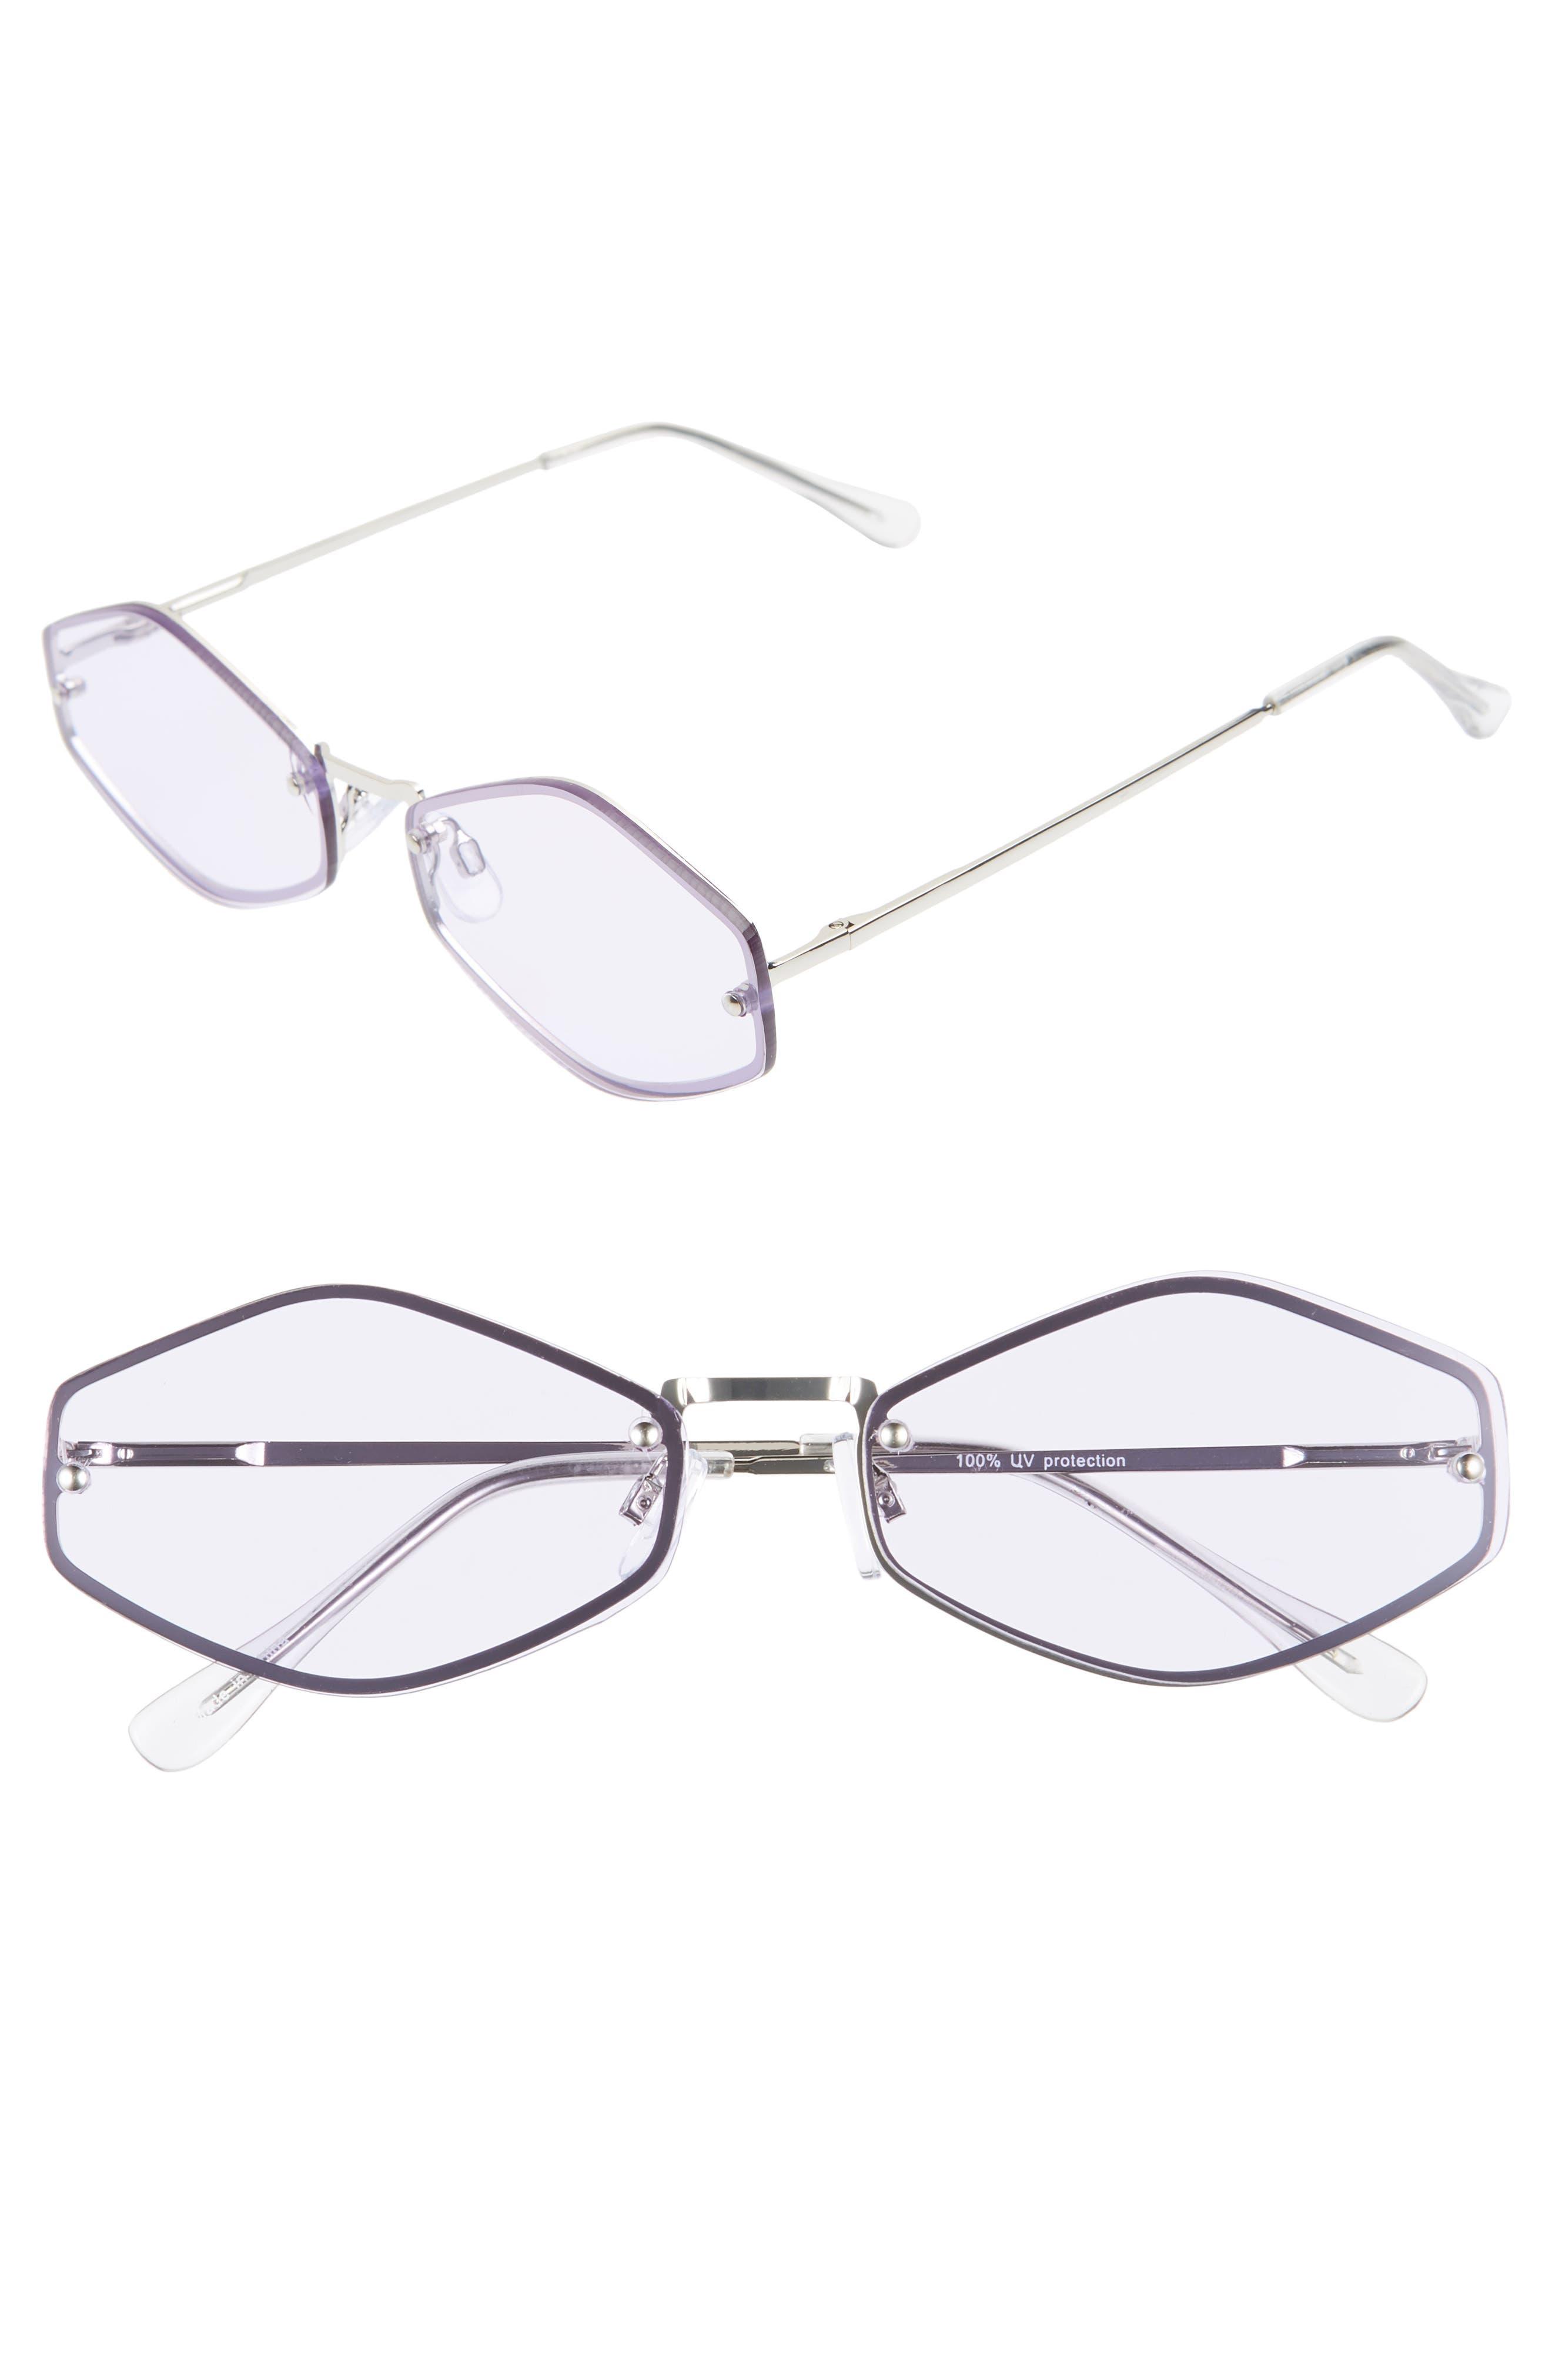 LEITH 62mm Rimless Geometric Sunglasses, Main, color, SILVER/ PURPLE